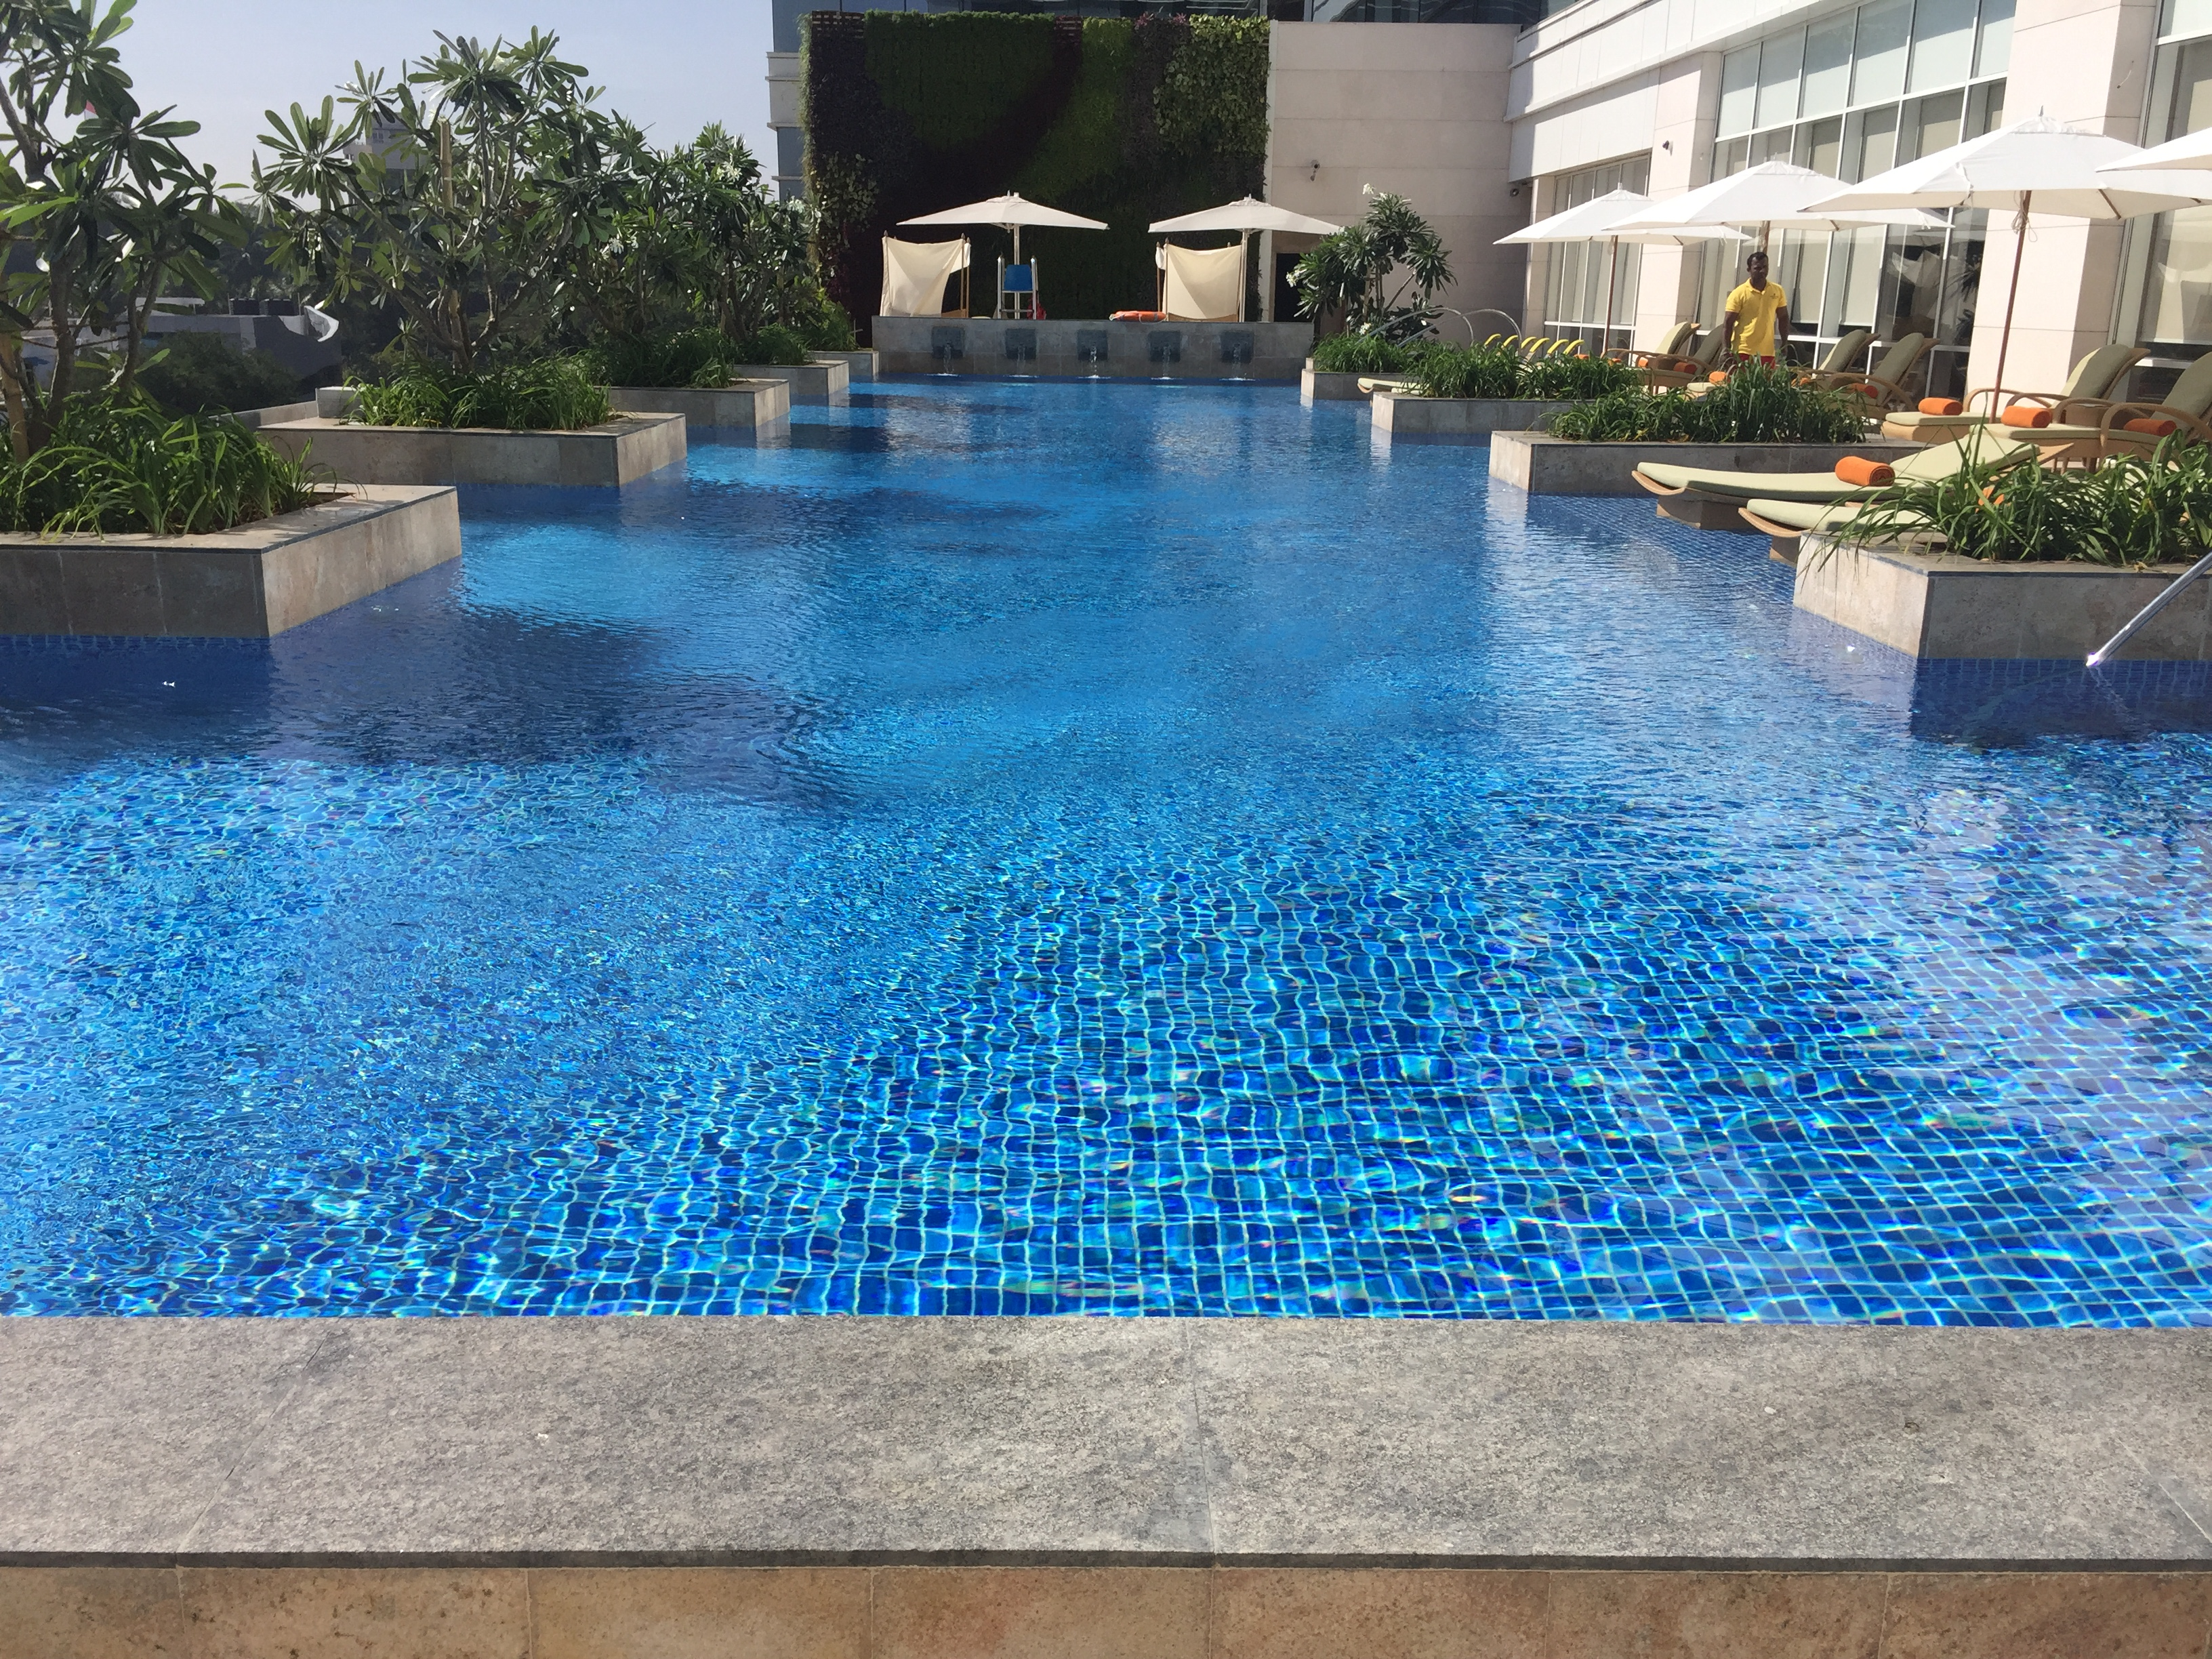 Bangalore staycation at shangri la hotel the wonderful Bangalore resorts with swimming pool